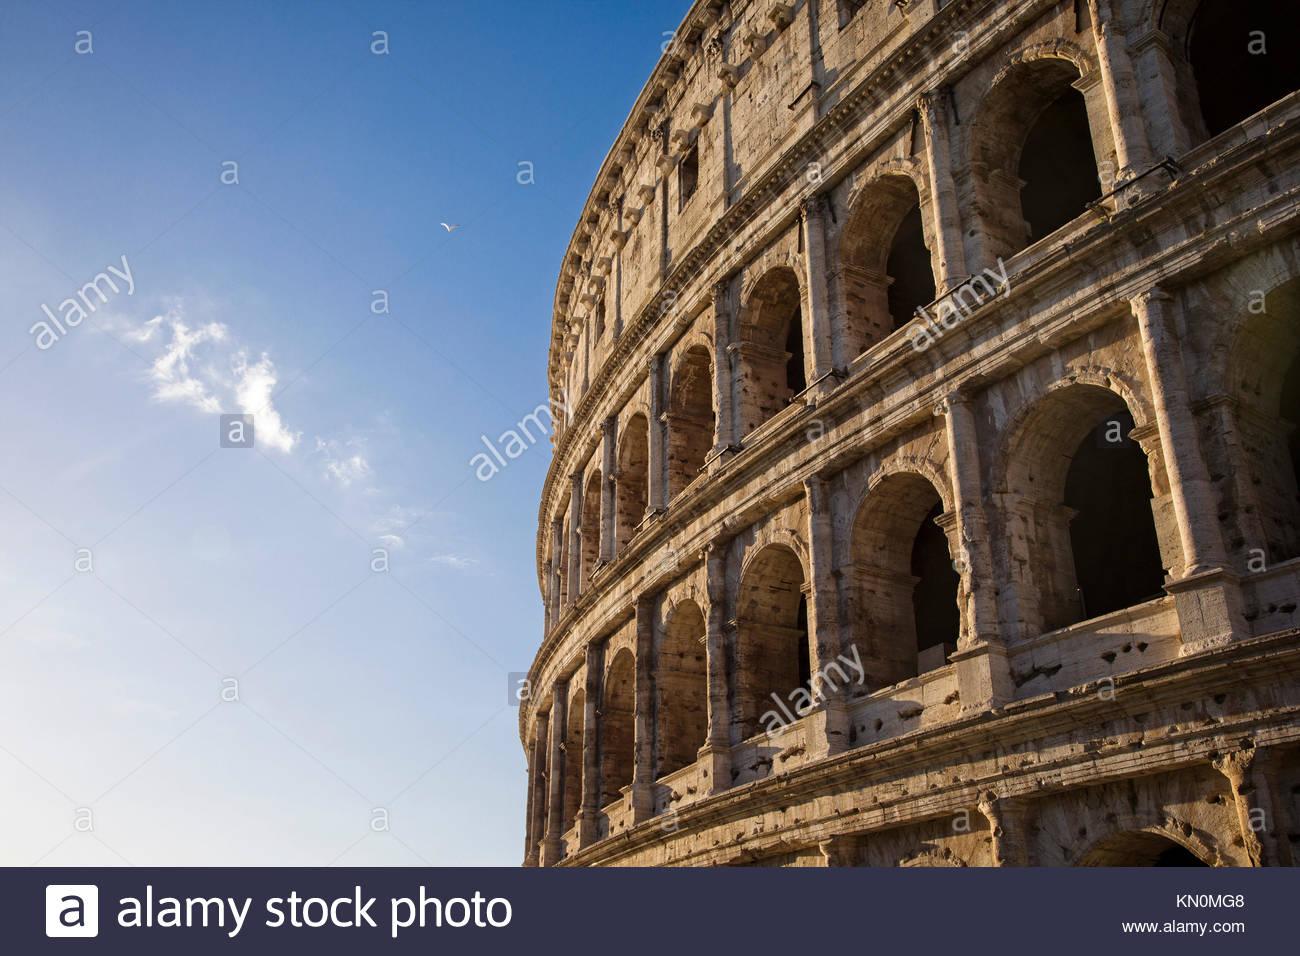 El Coliseo de Roma, Italia. Imagen De Stock